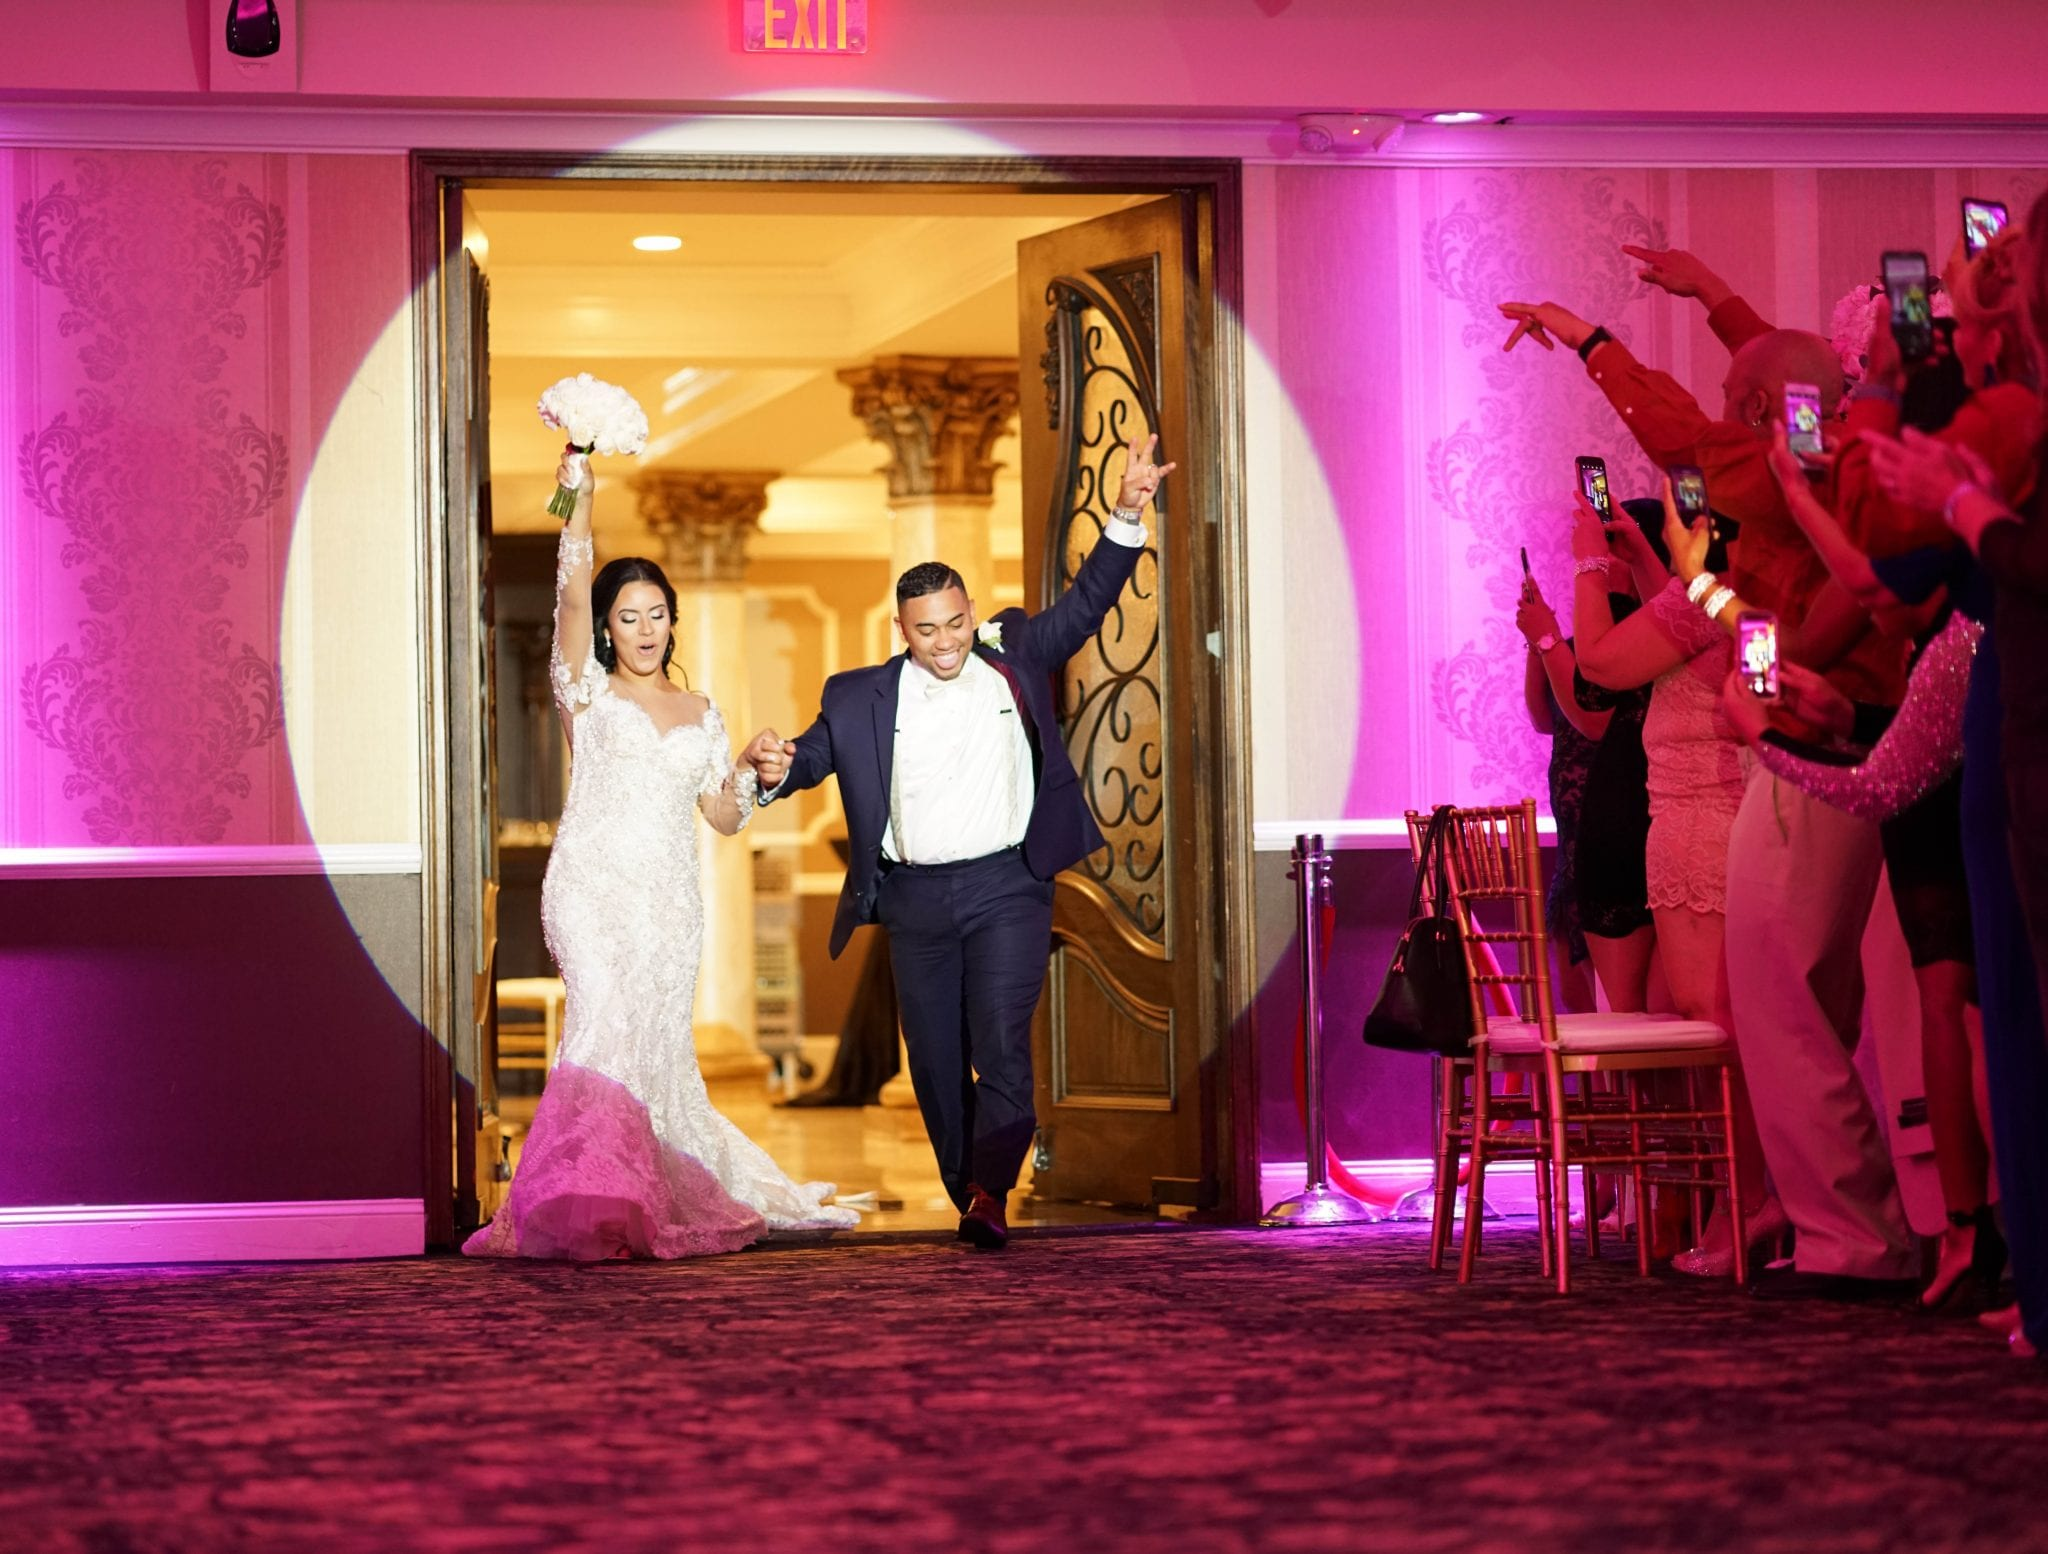 Latin Wedding Ceremony DJ in New Jersey | LEM Entertainment